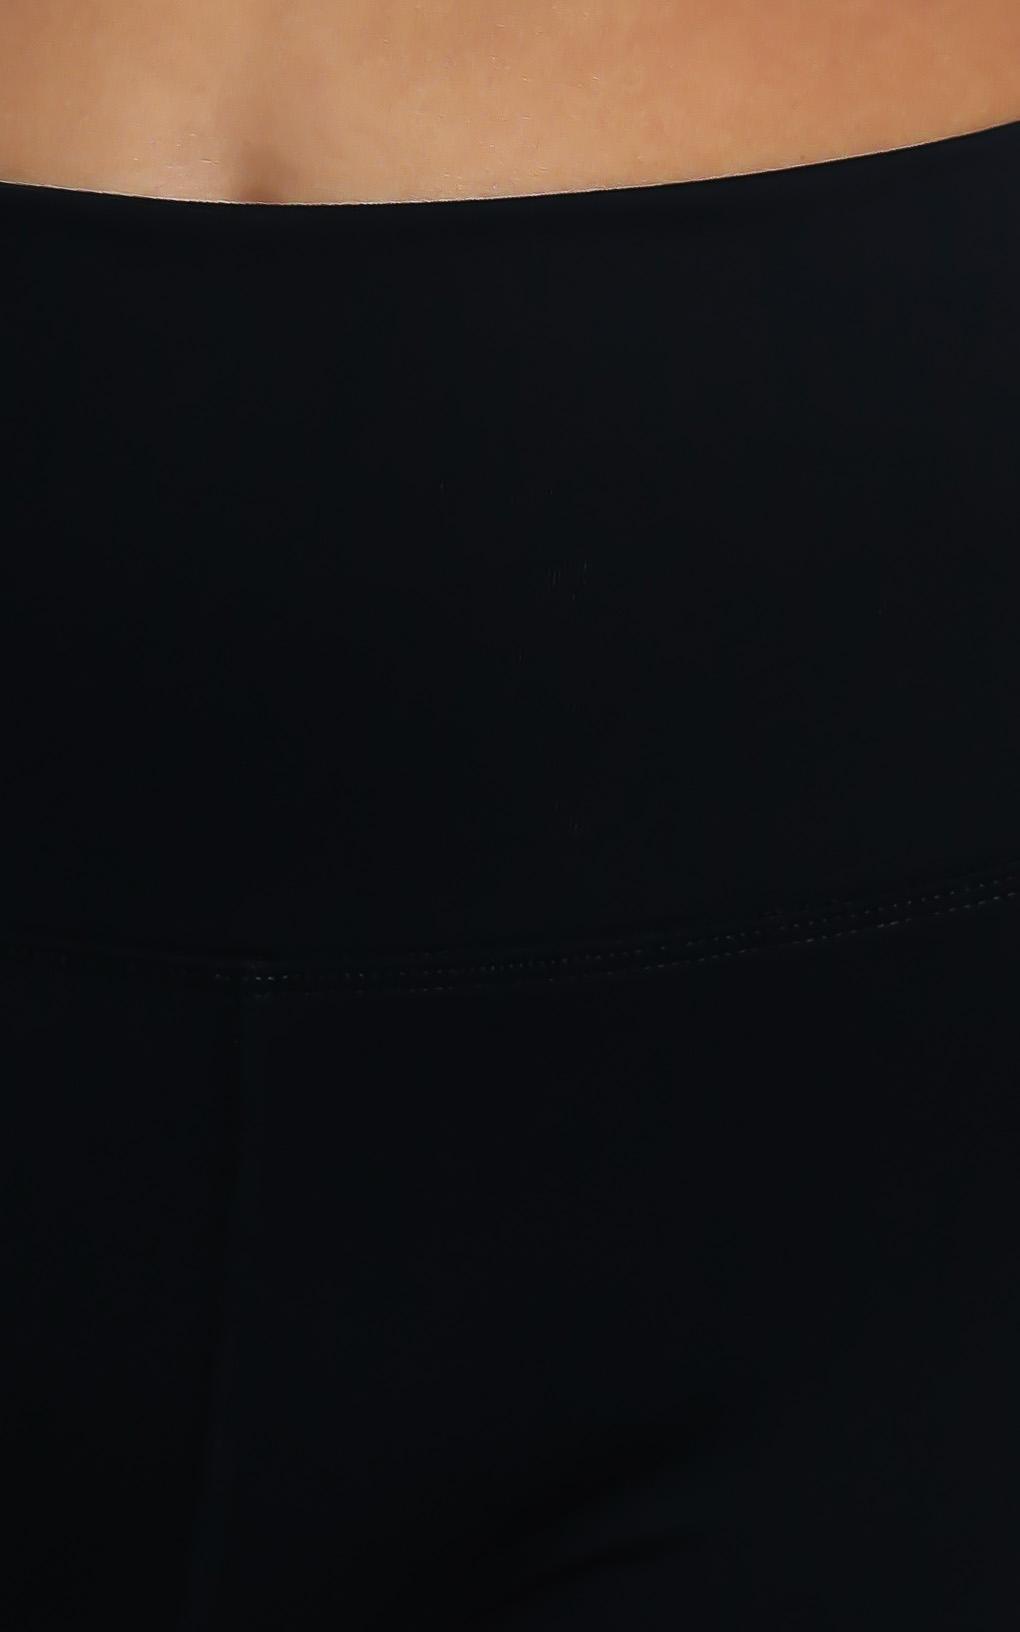 Cheska Bike Shorts in Black - 12 (L), Black, hi-res image number null